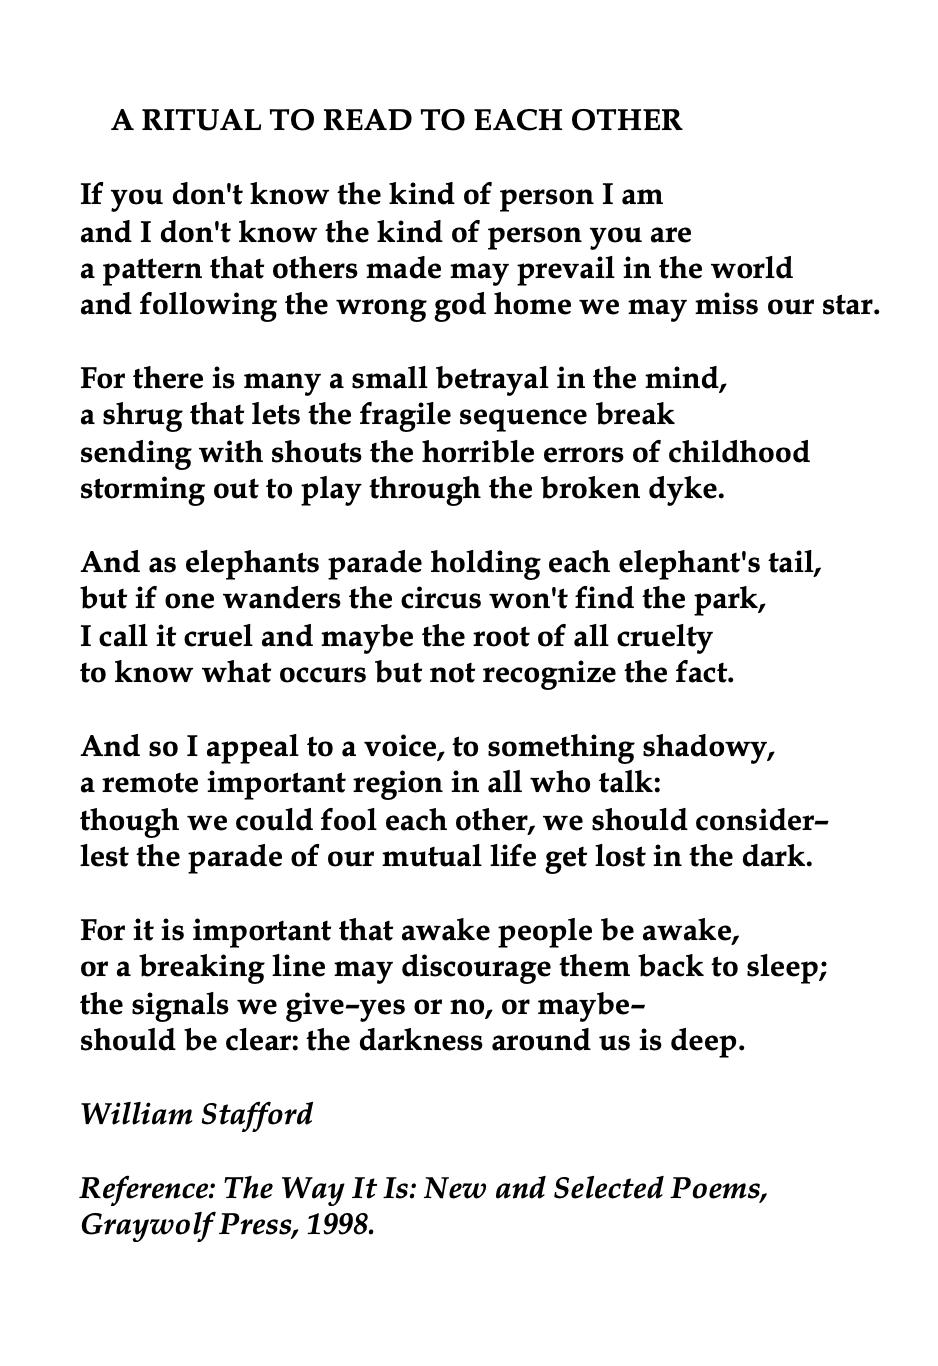 William Stafford American Poet Good Bone Poem Poetry Words The Dawn Awake Explanation